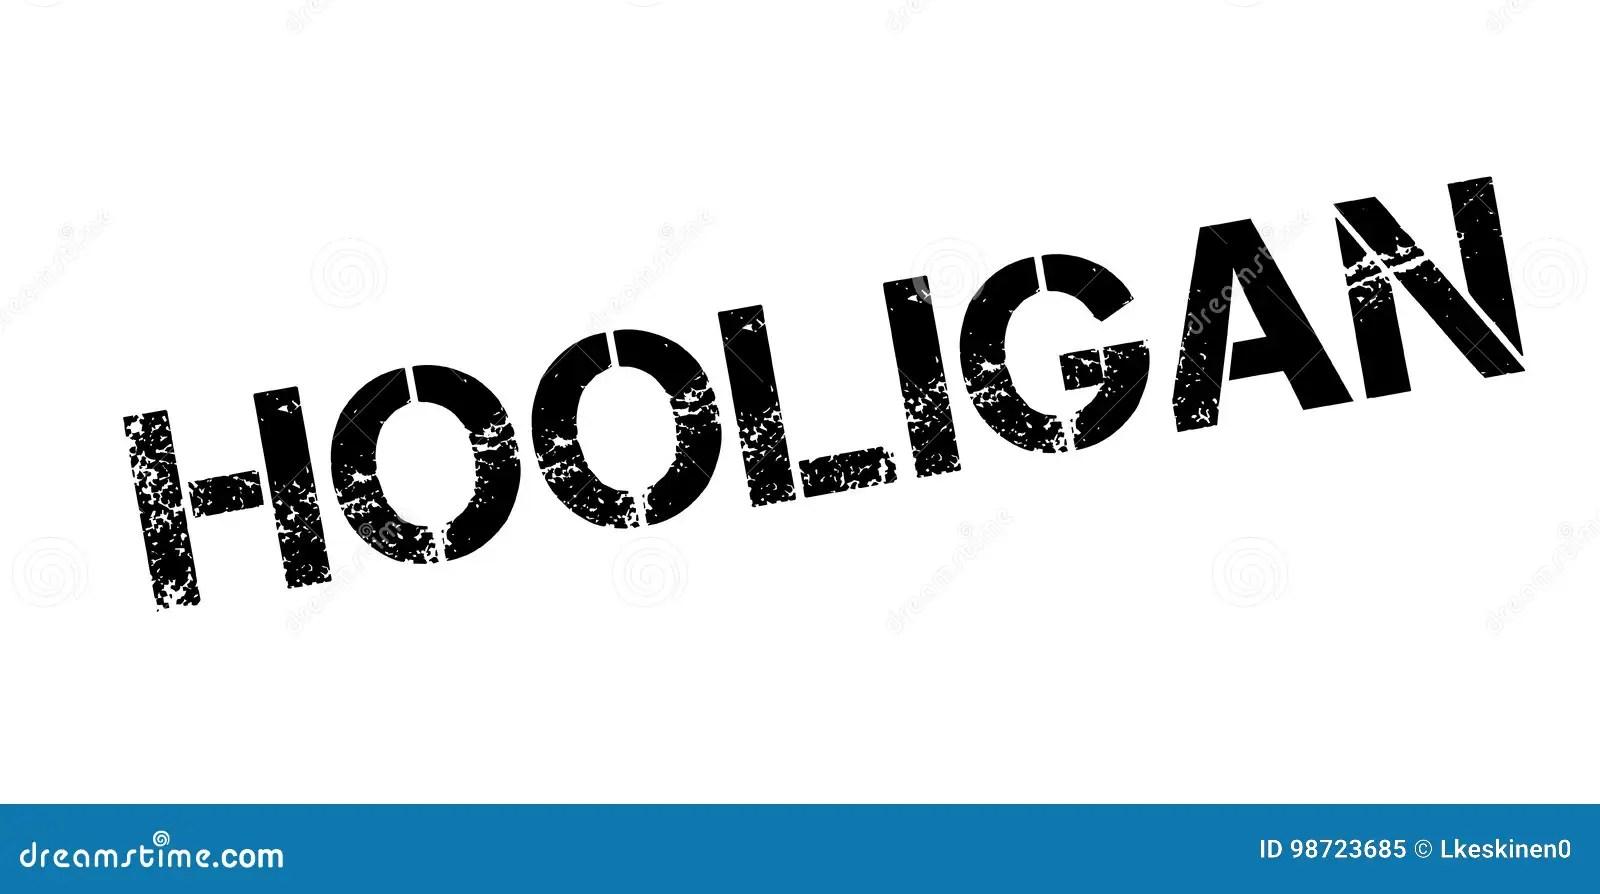 Hooligan rubber stamp stock vector. Illustration of gang